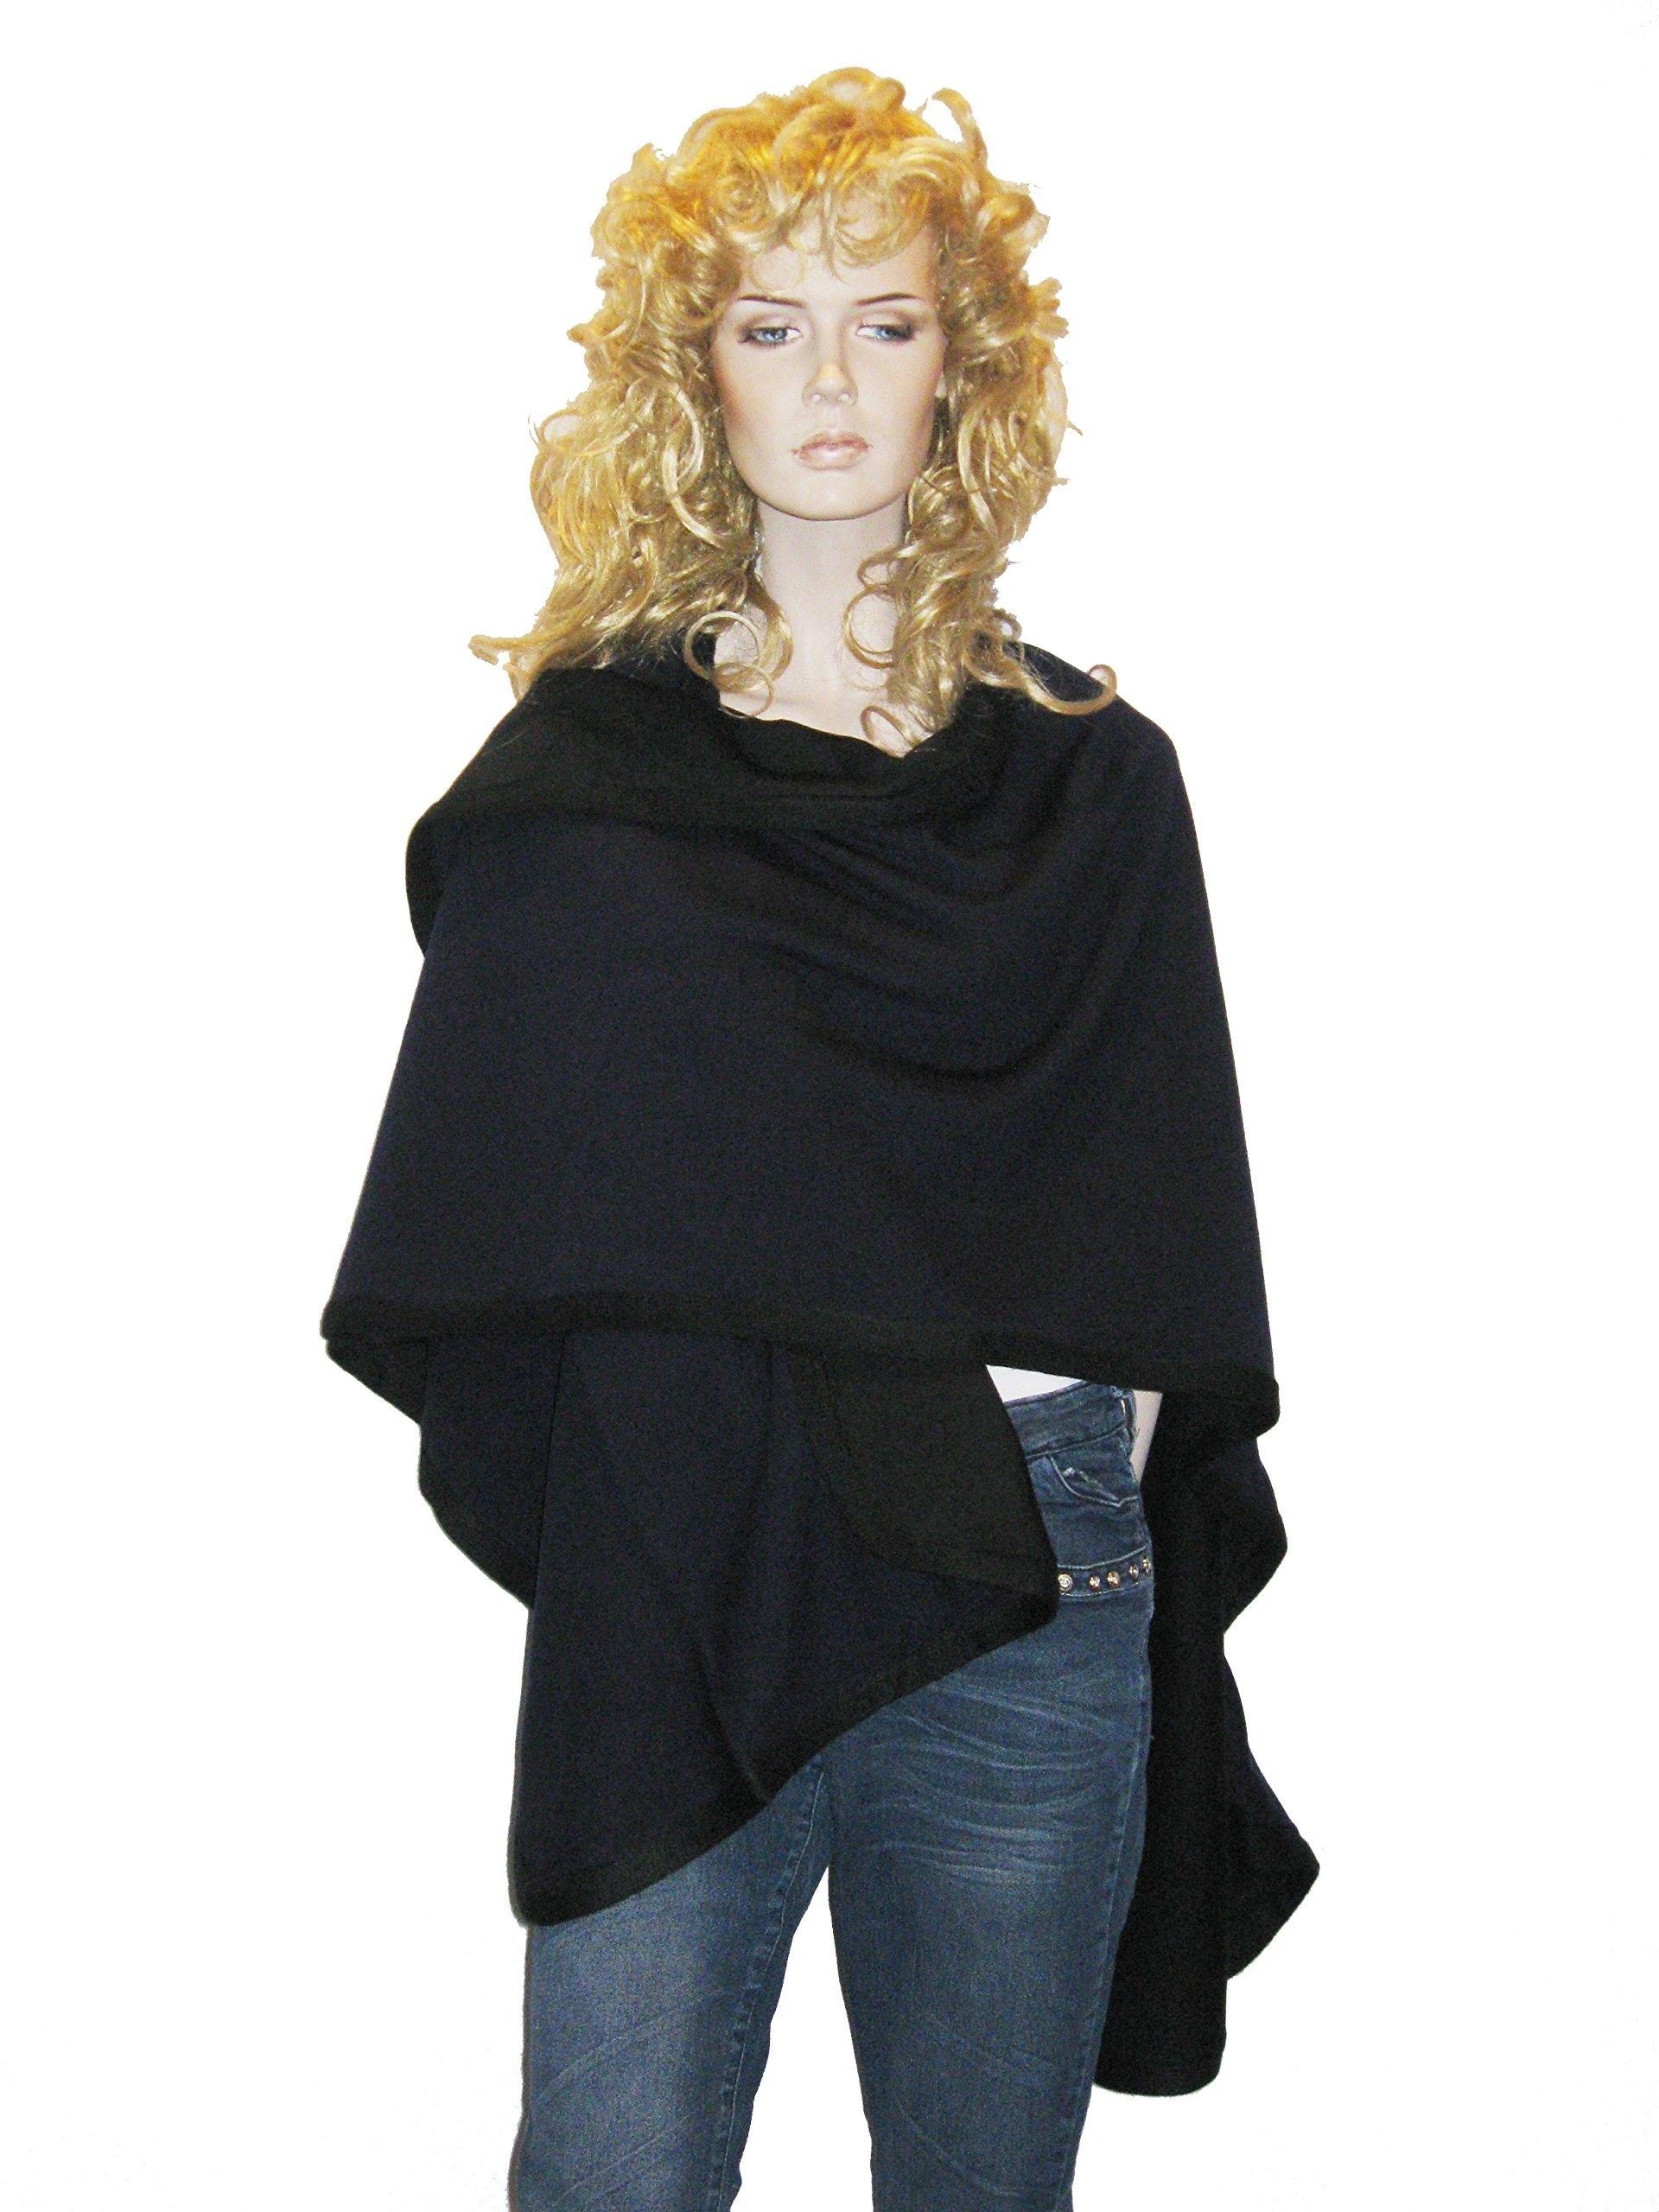 Cashmere Pashmina Group- Cape Woolen Reversible Ruana Knitted Poncho Shawl Cardigans Sweater Coat (Black/ Inky Navy)